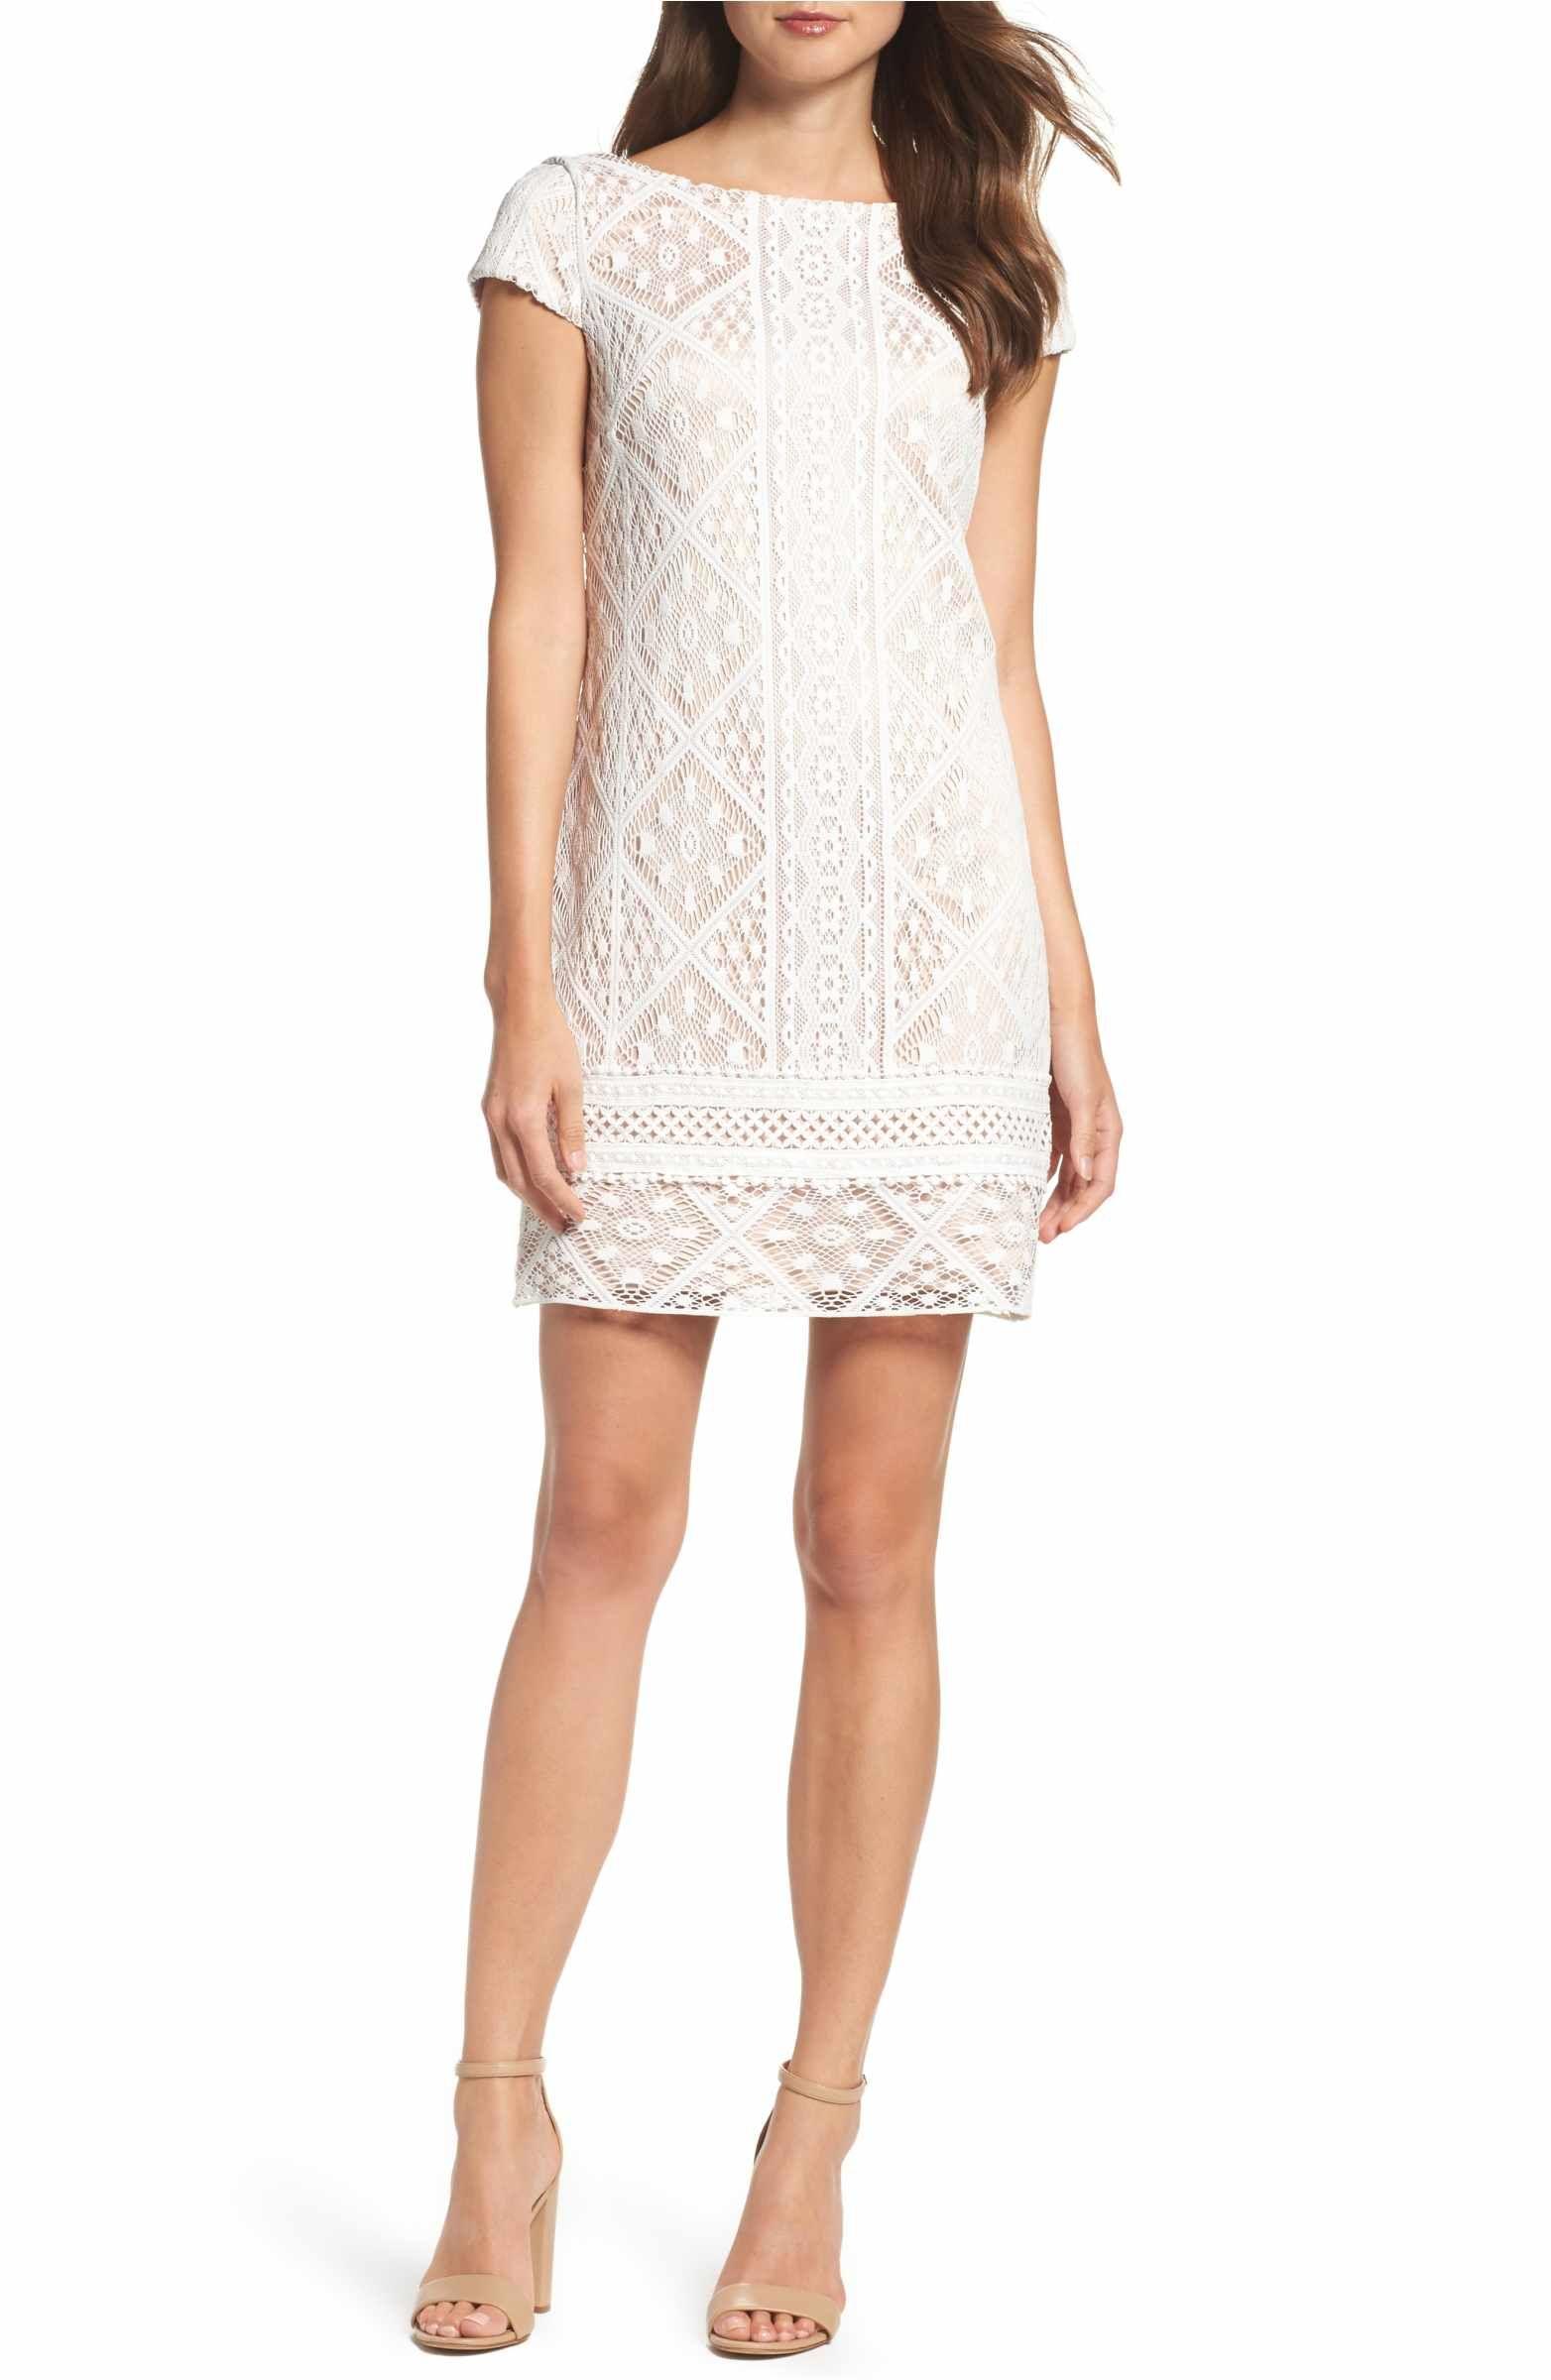 Vince Camuto Lace Shift Dress Regular Petite Nordstrom Lace Shift Dress White Lace Cocktail Dress White Dresses For Women [ 2400 x 1564 Pixel ]